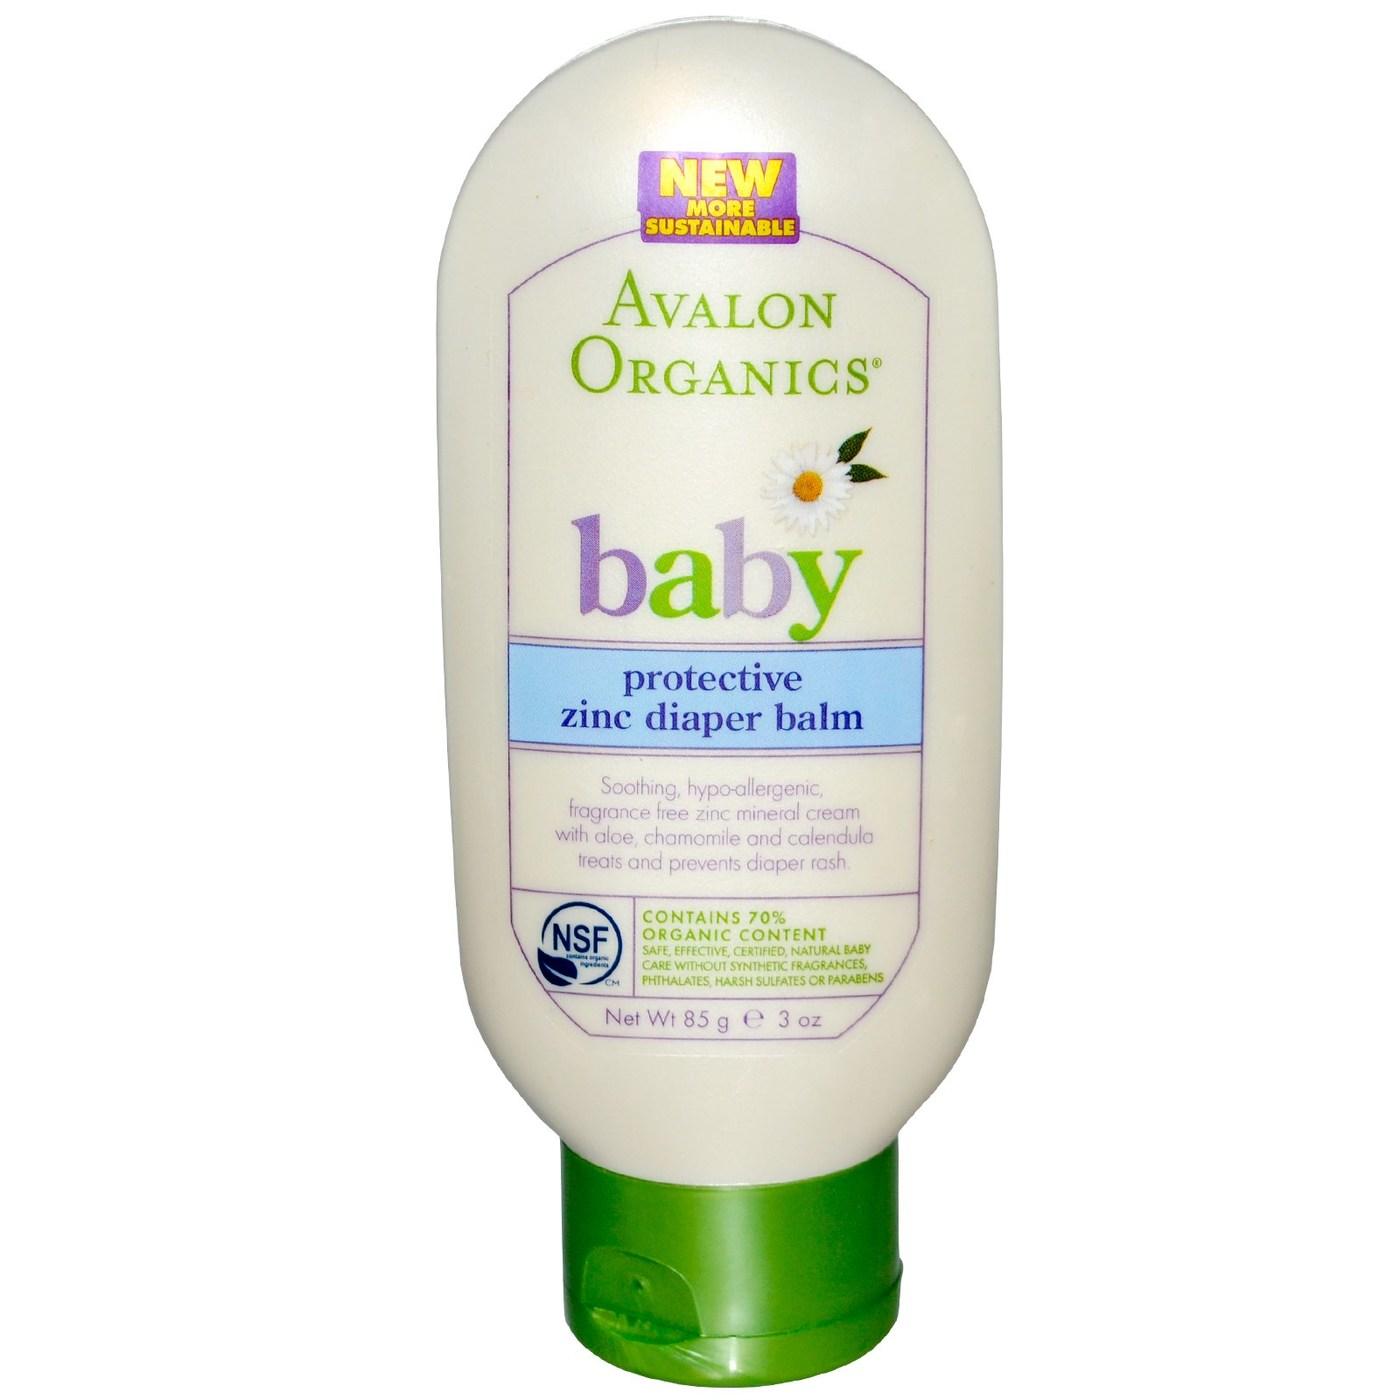 Avalon baby